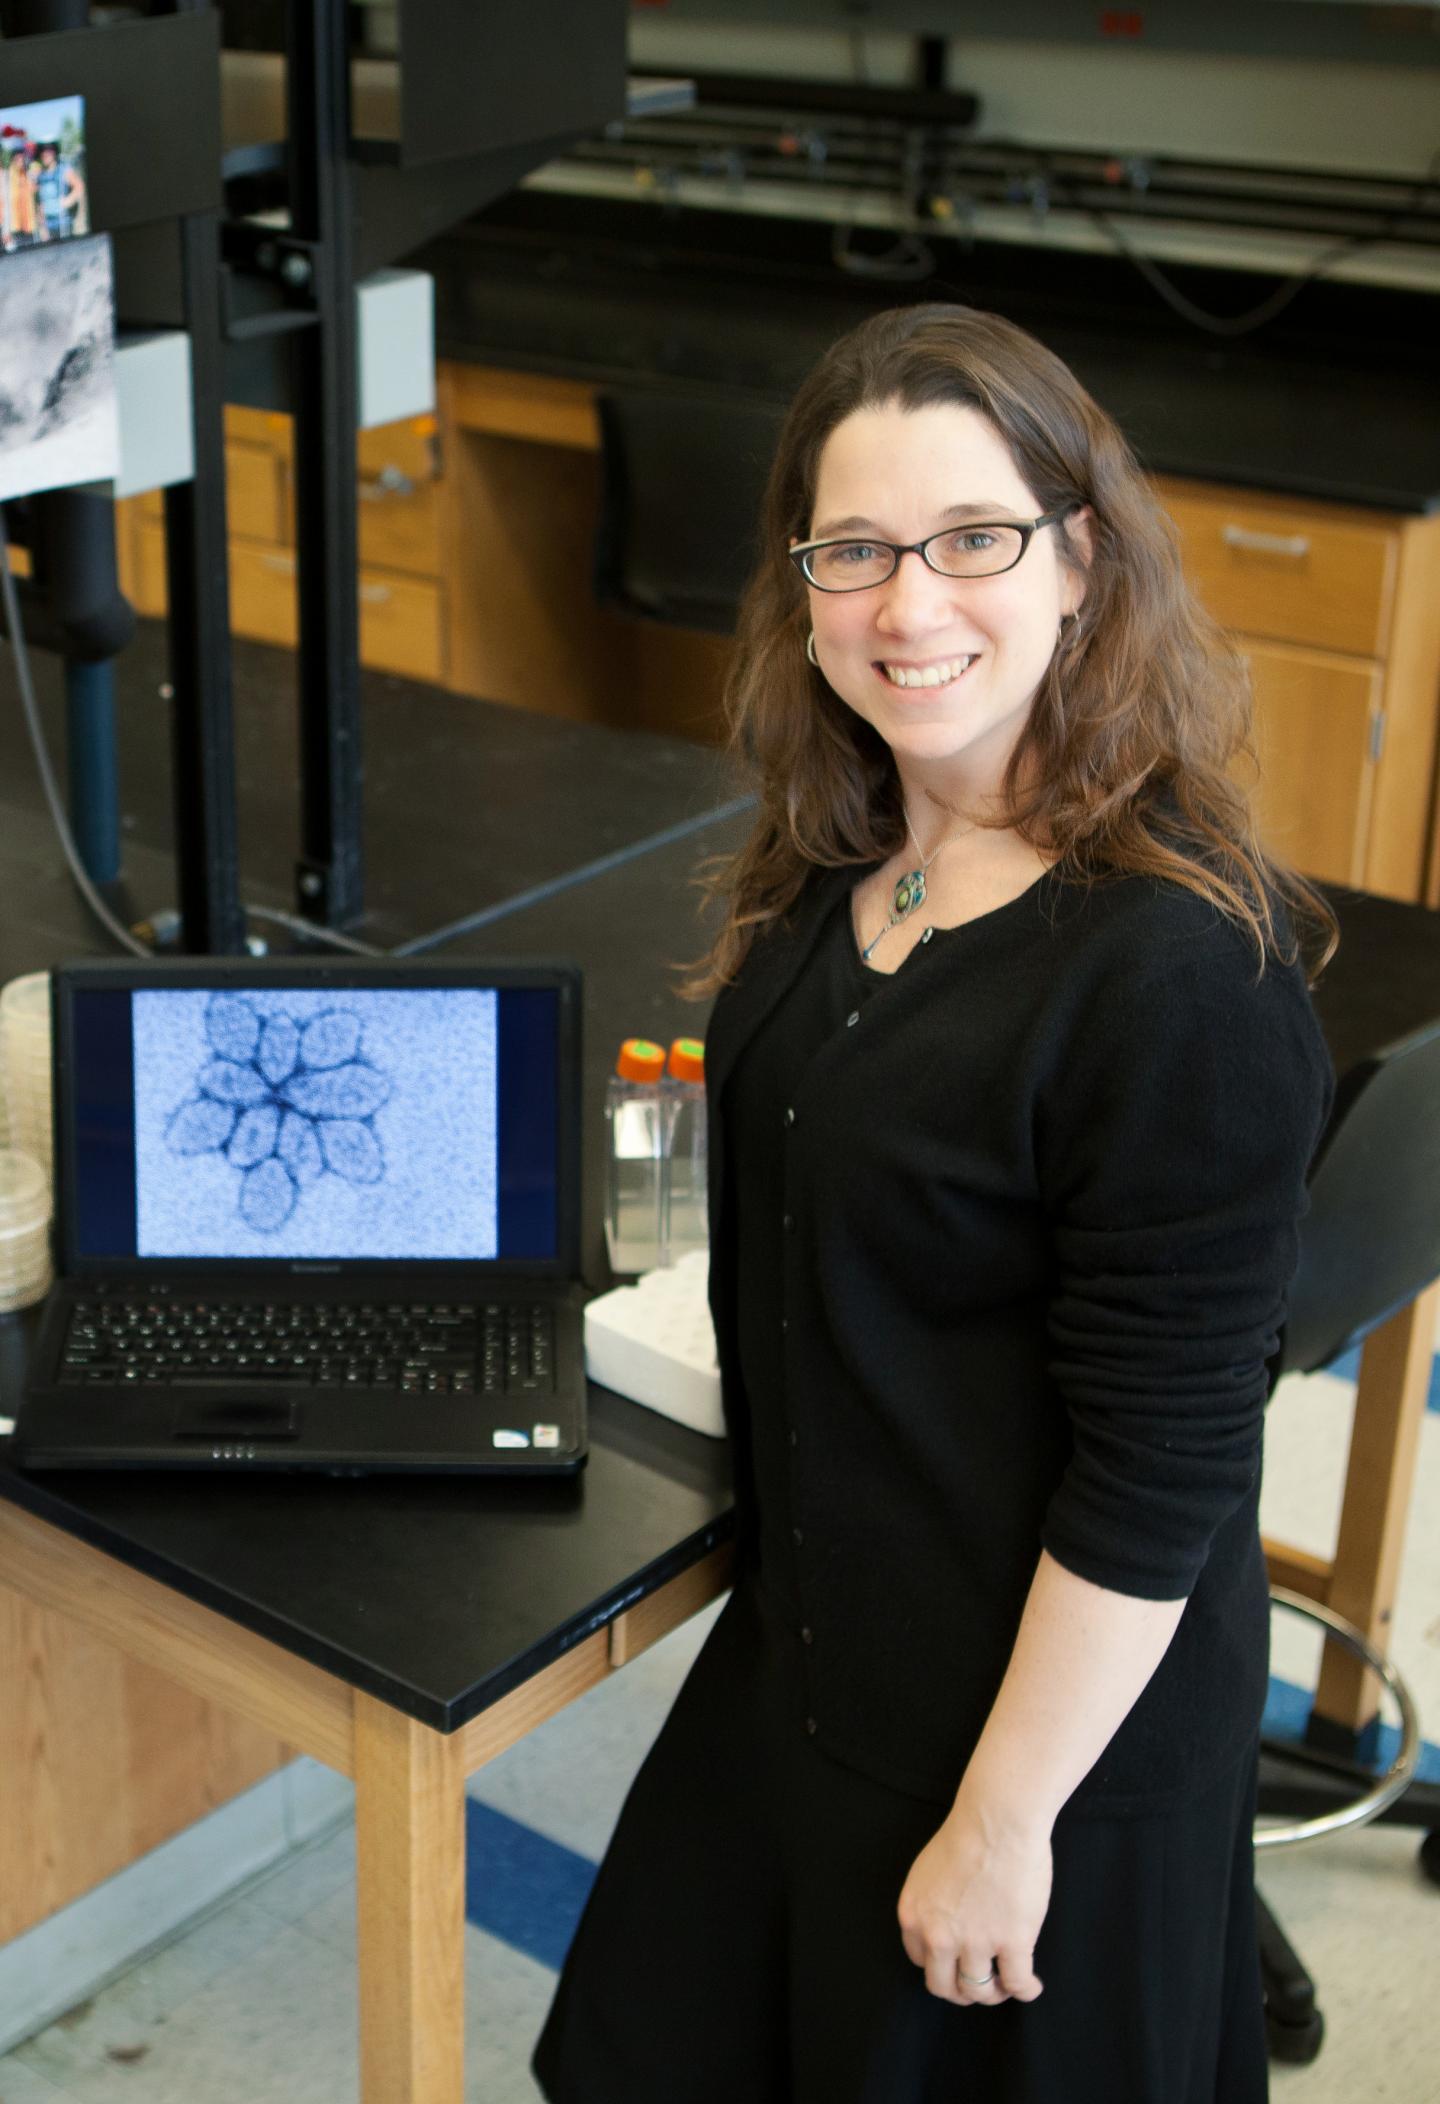 Rachel Whitaker, Institute for Genomic Biology, University of Illinois at Urbana-Champaign